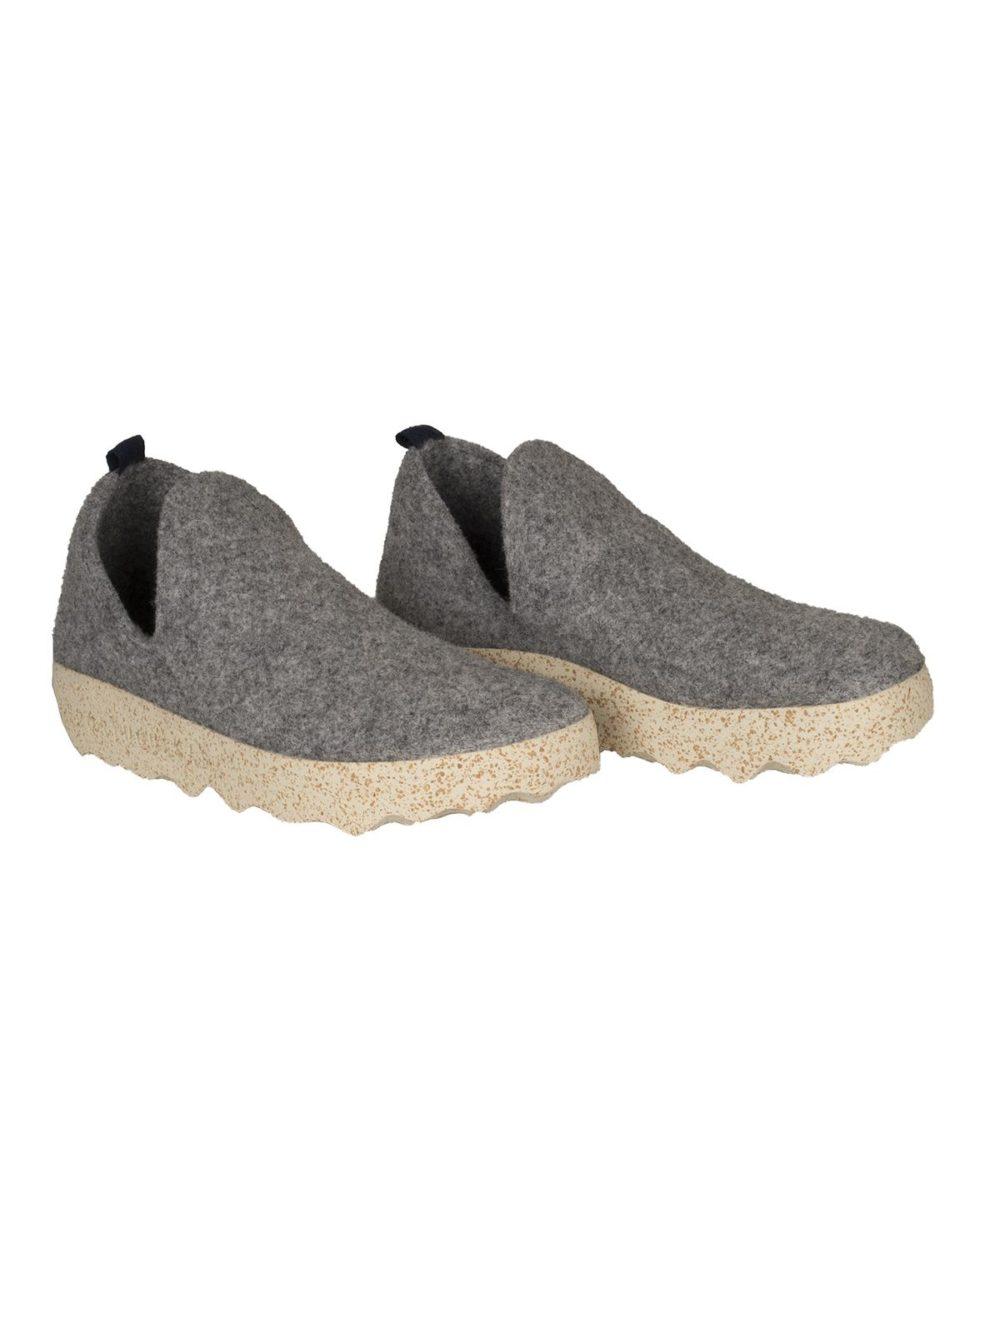 AS Portuguesas City Shoe Softinos Katie Kerr Women's Clothing Women's Shoes